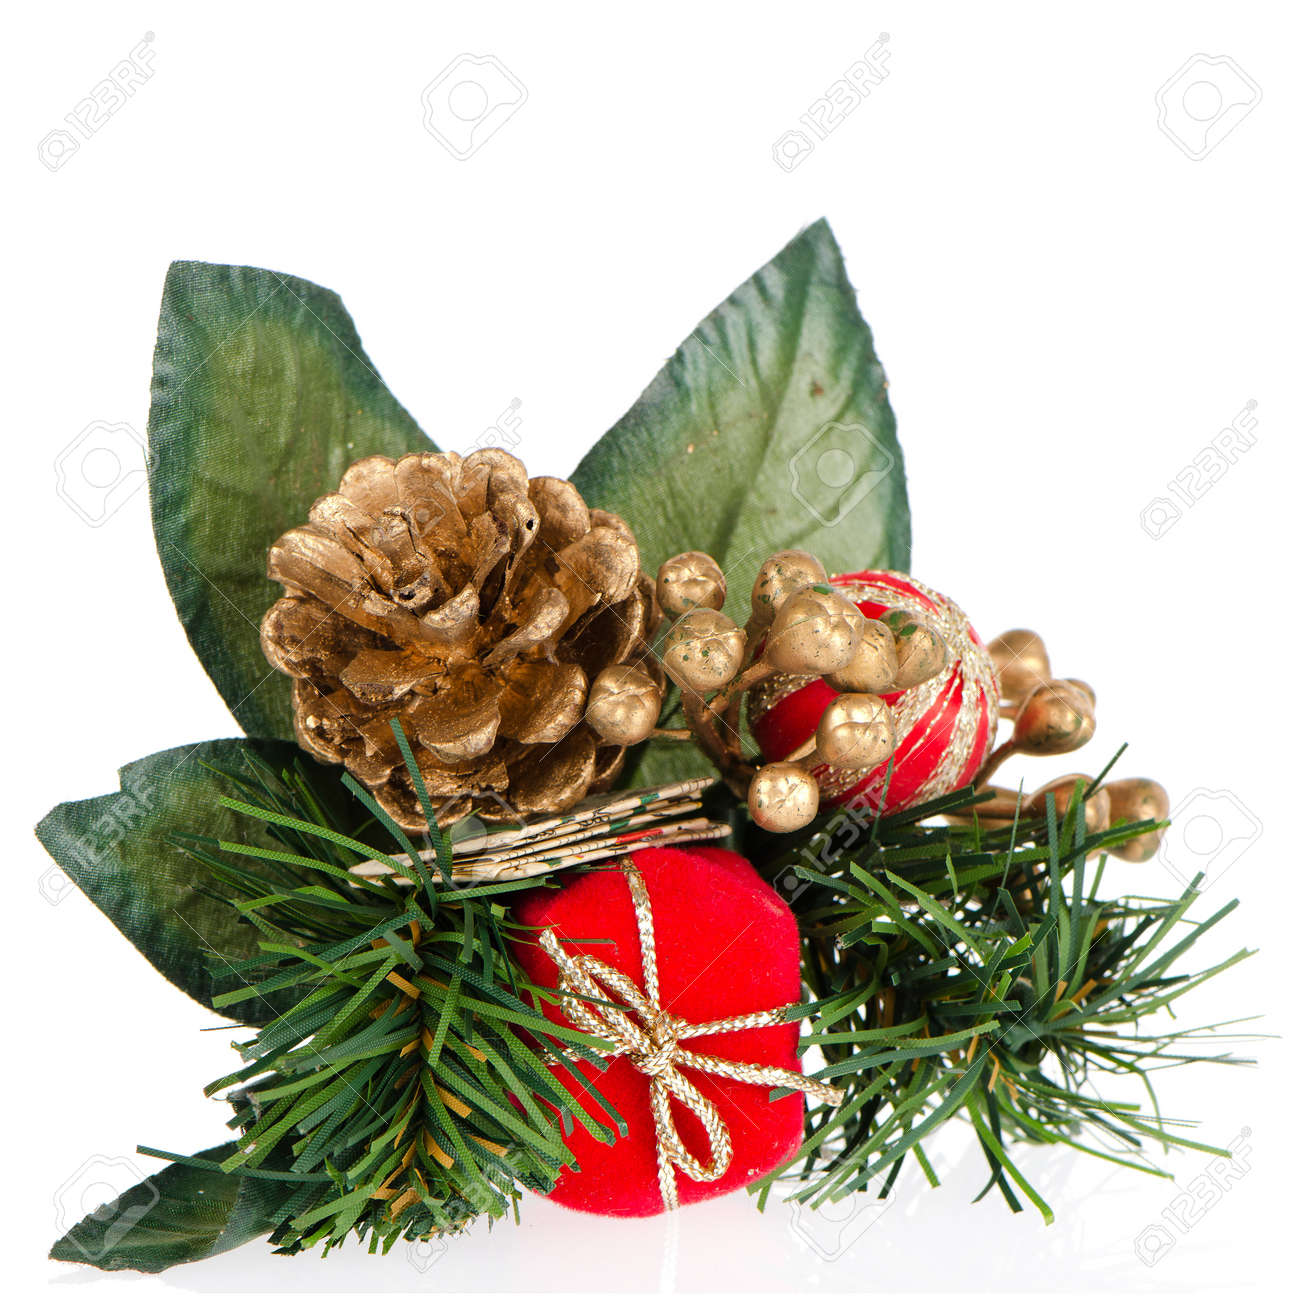 Christmas decorations on white reflective background. - 16206546